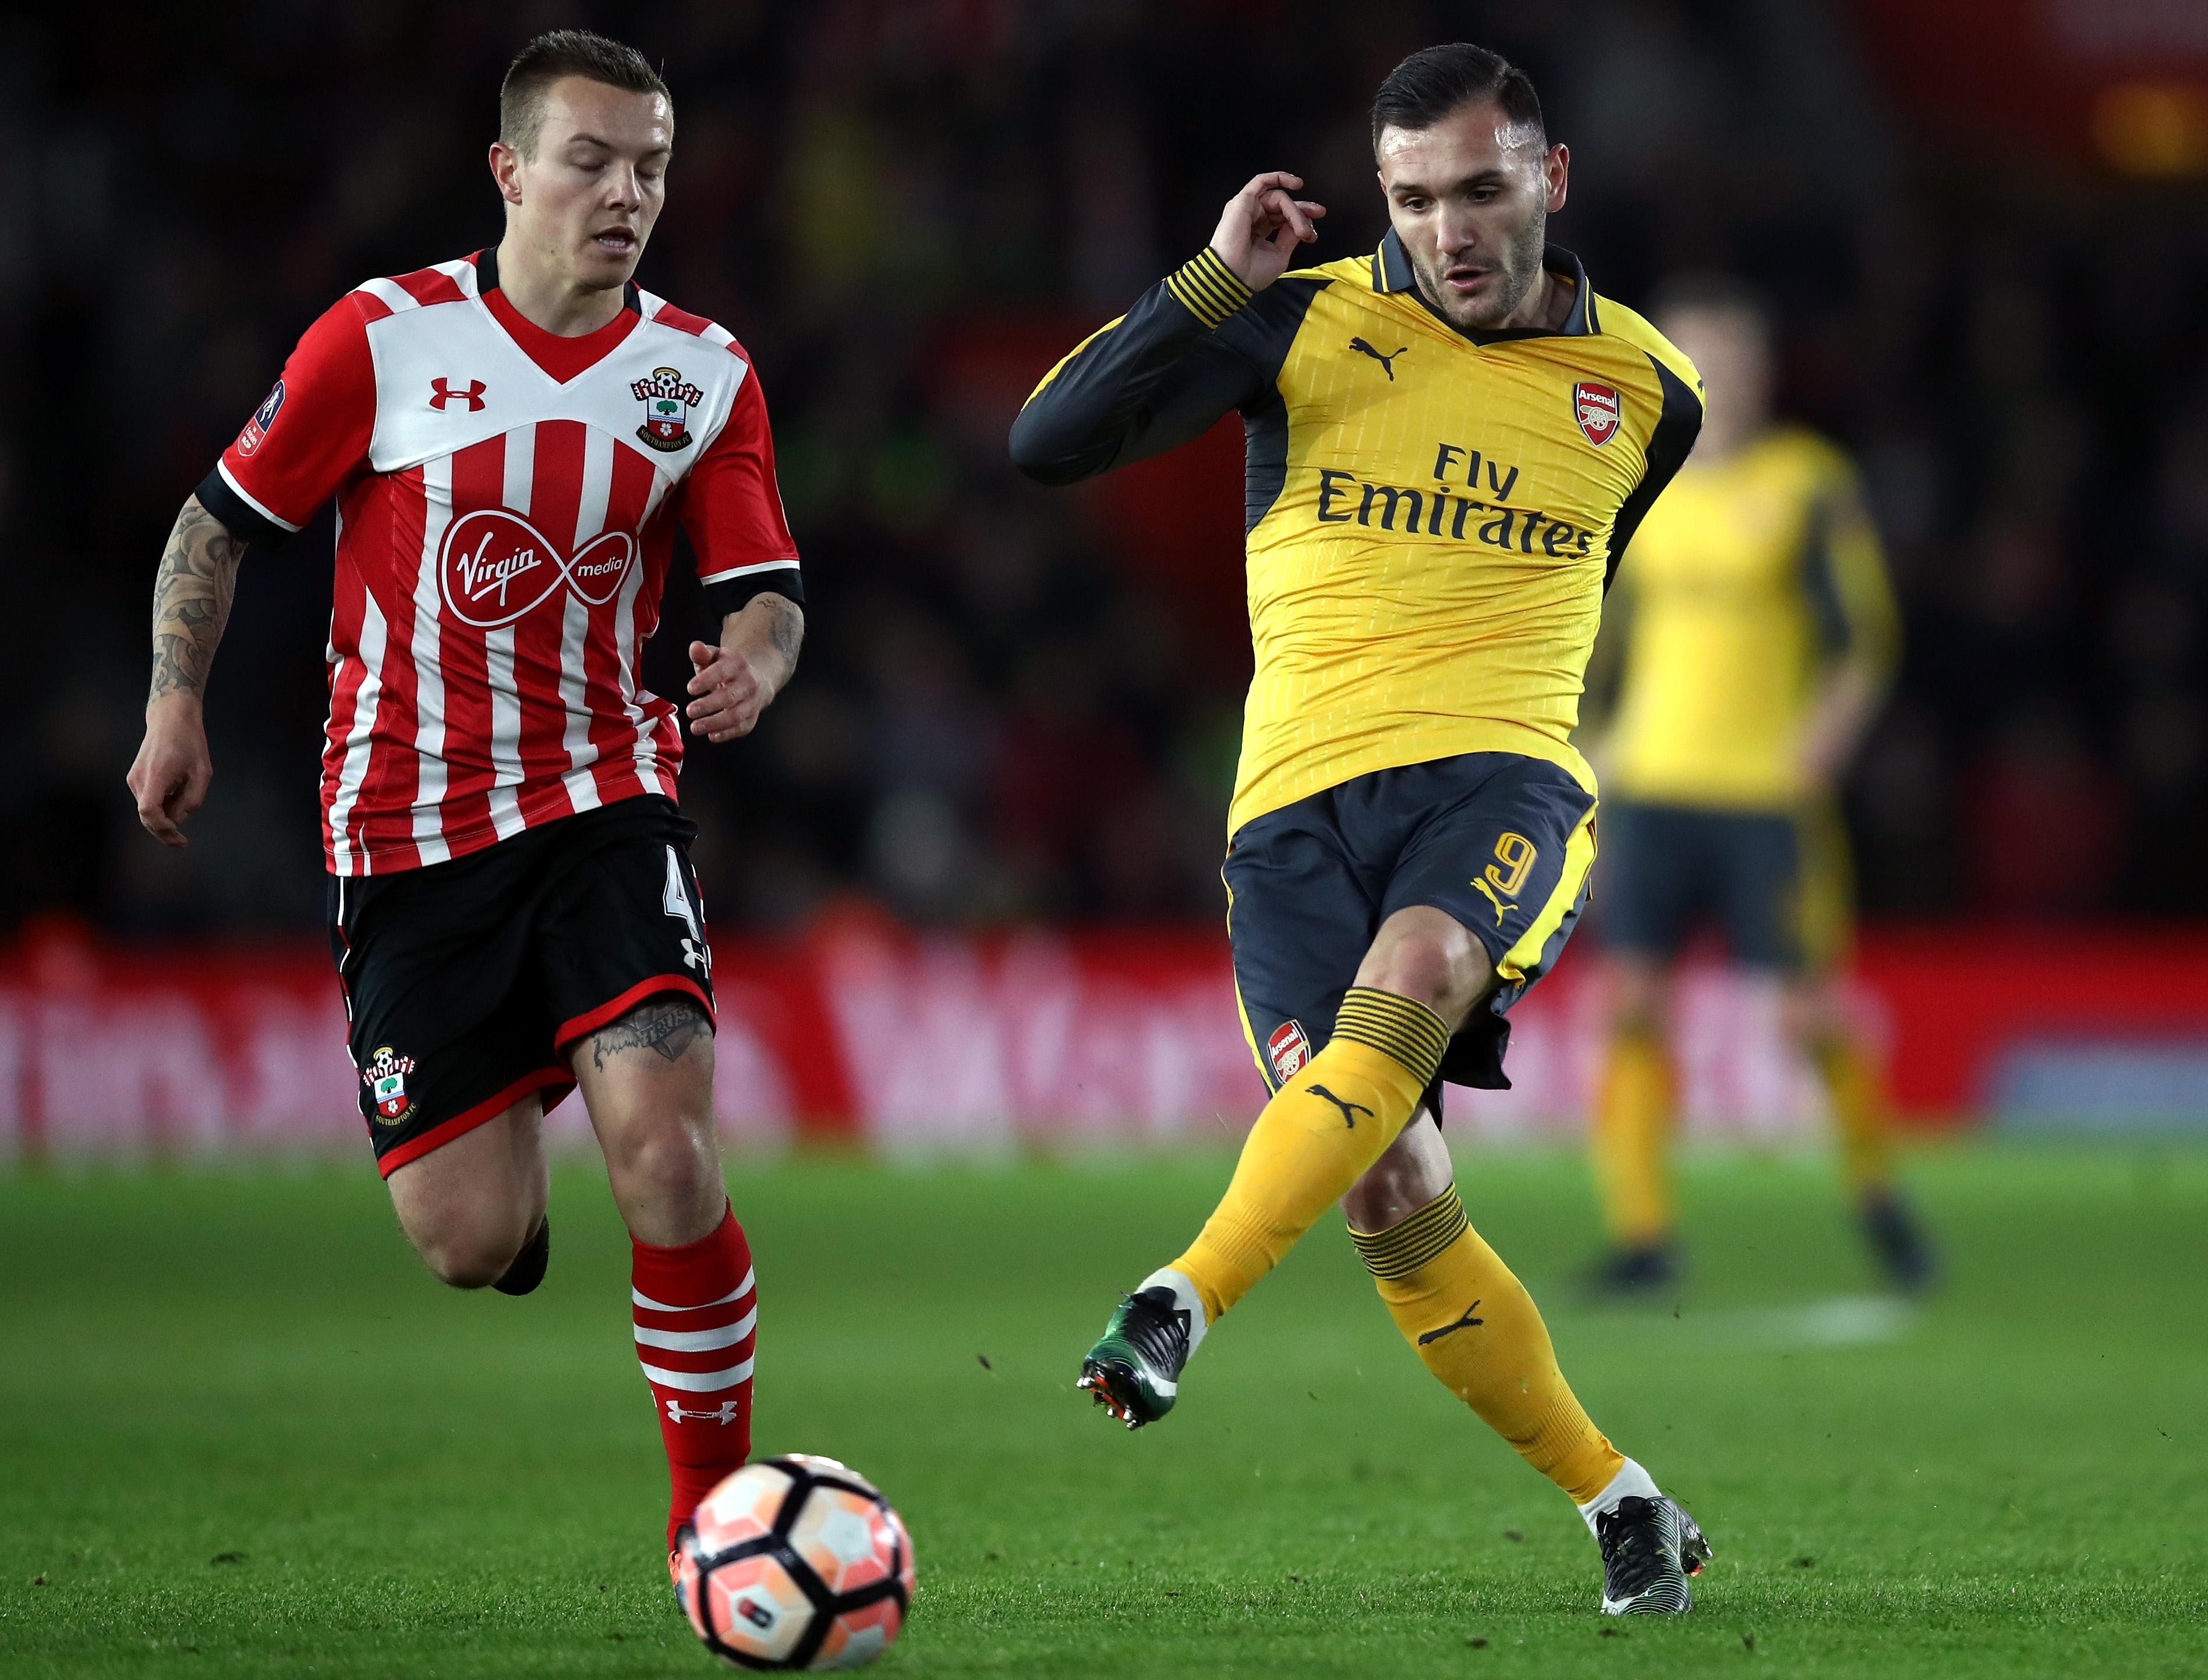 Arsenal Vs Southampton: 5 Things We Learned